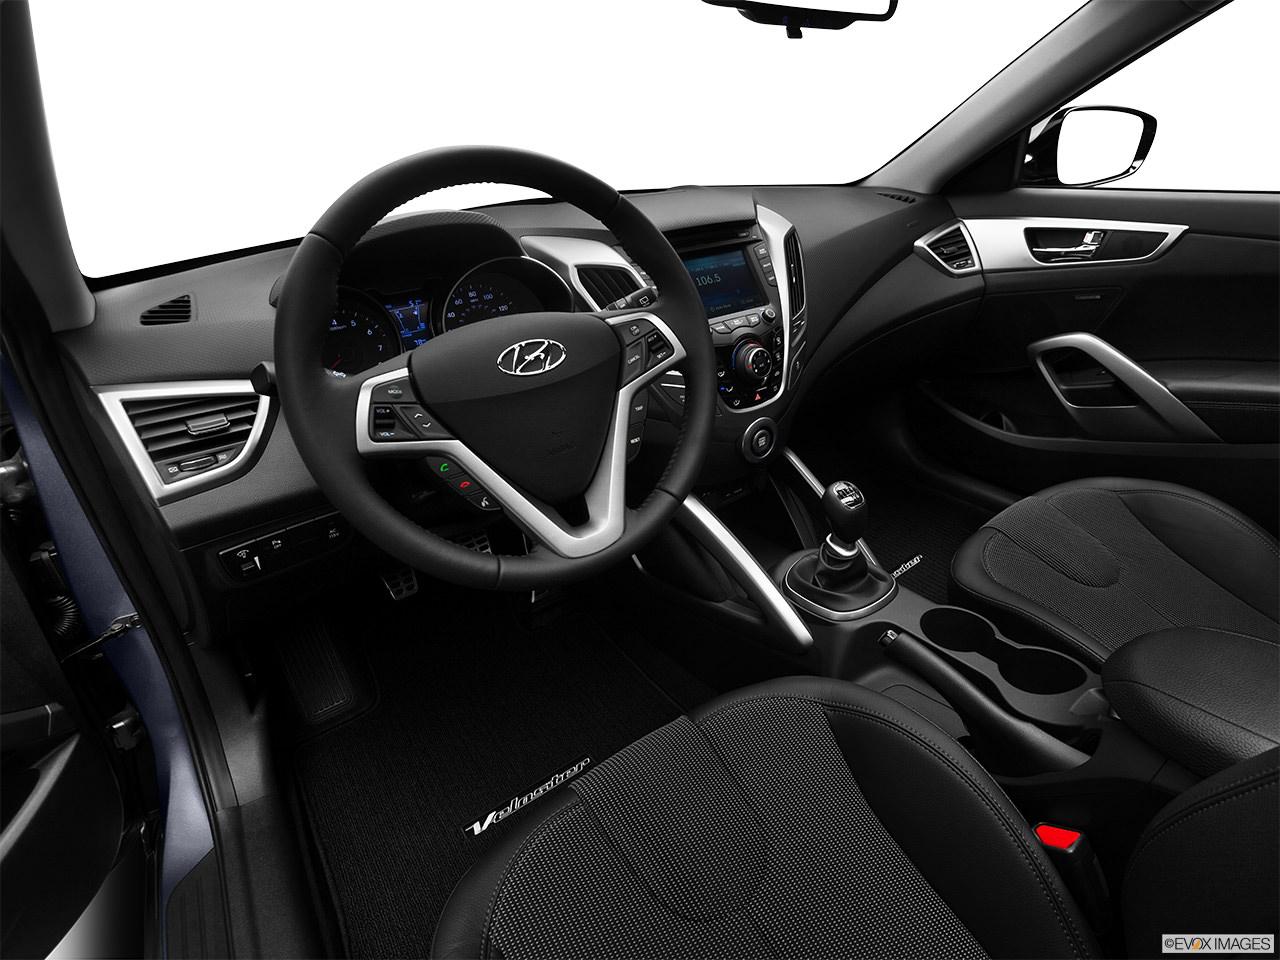 Hyundai Veloster 2012 Interior